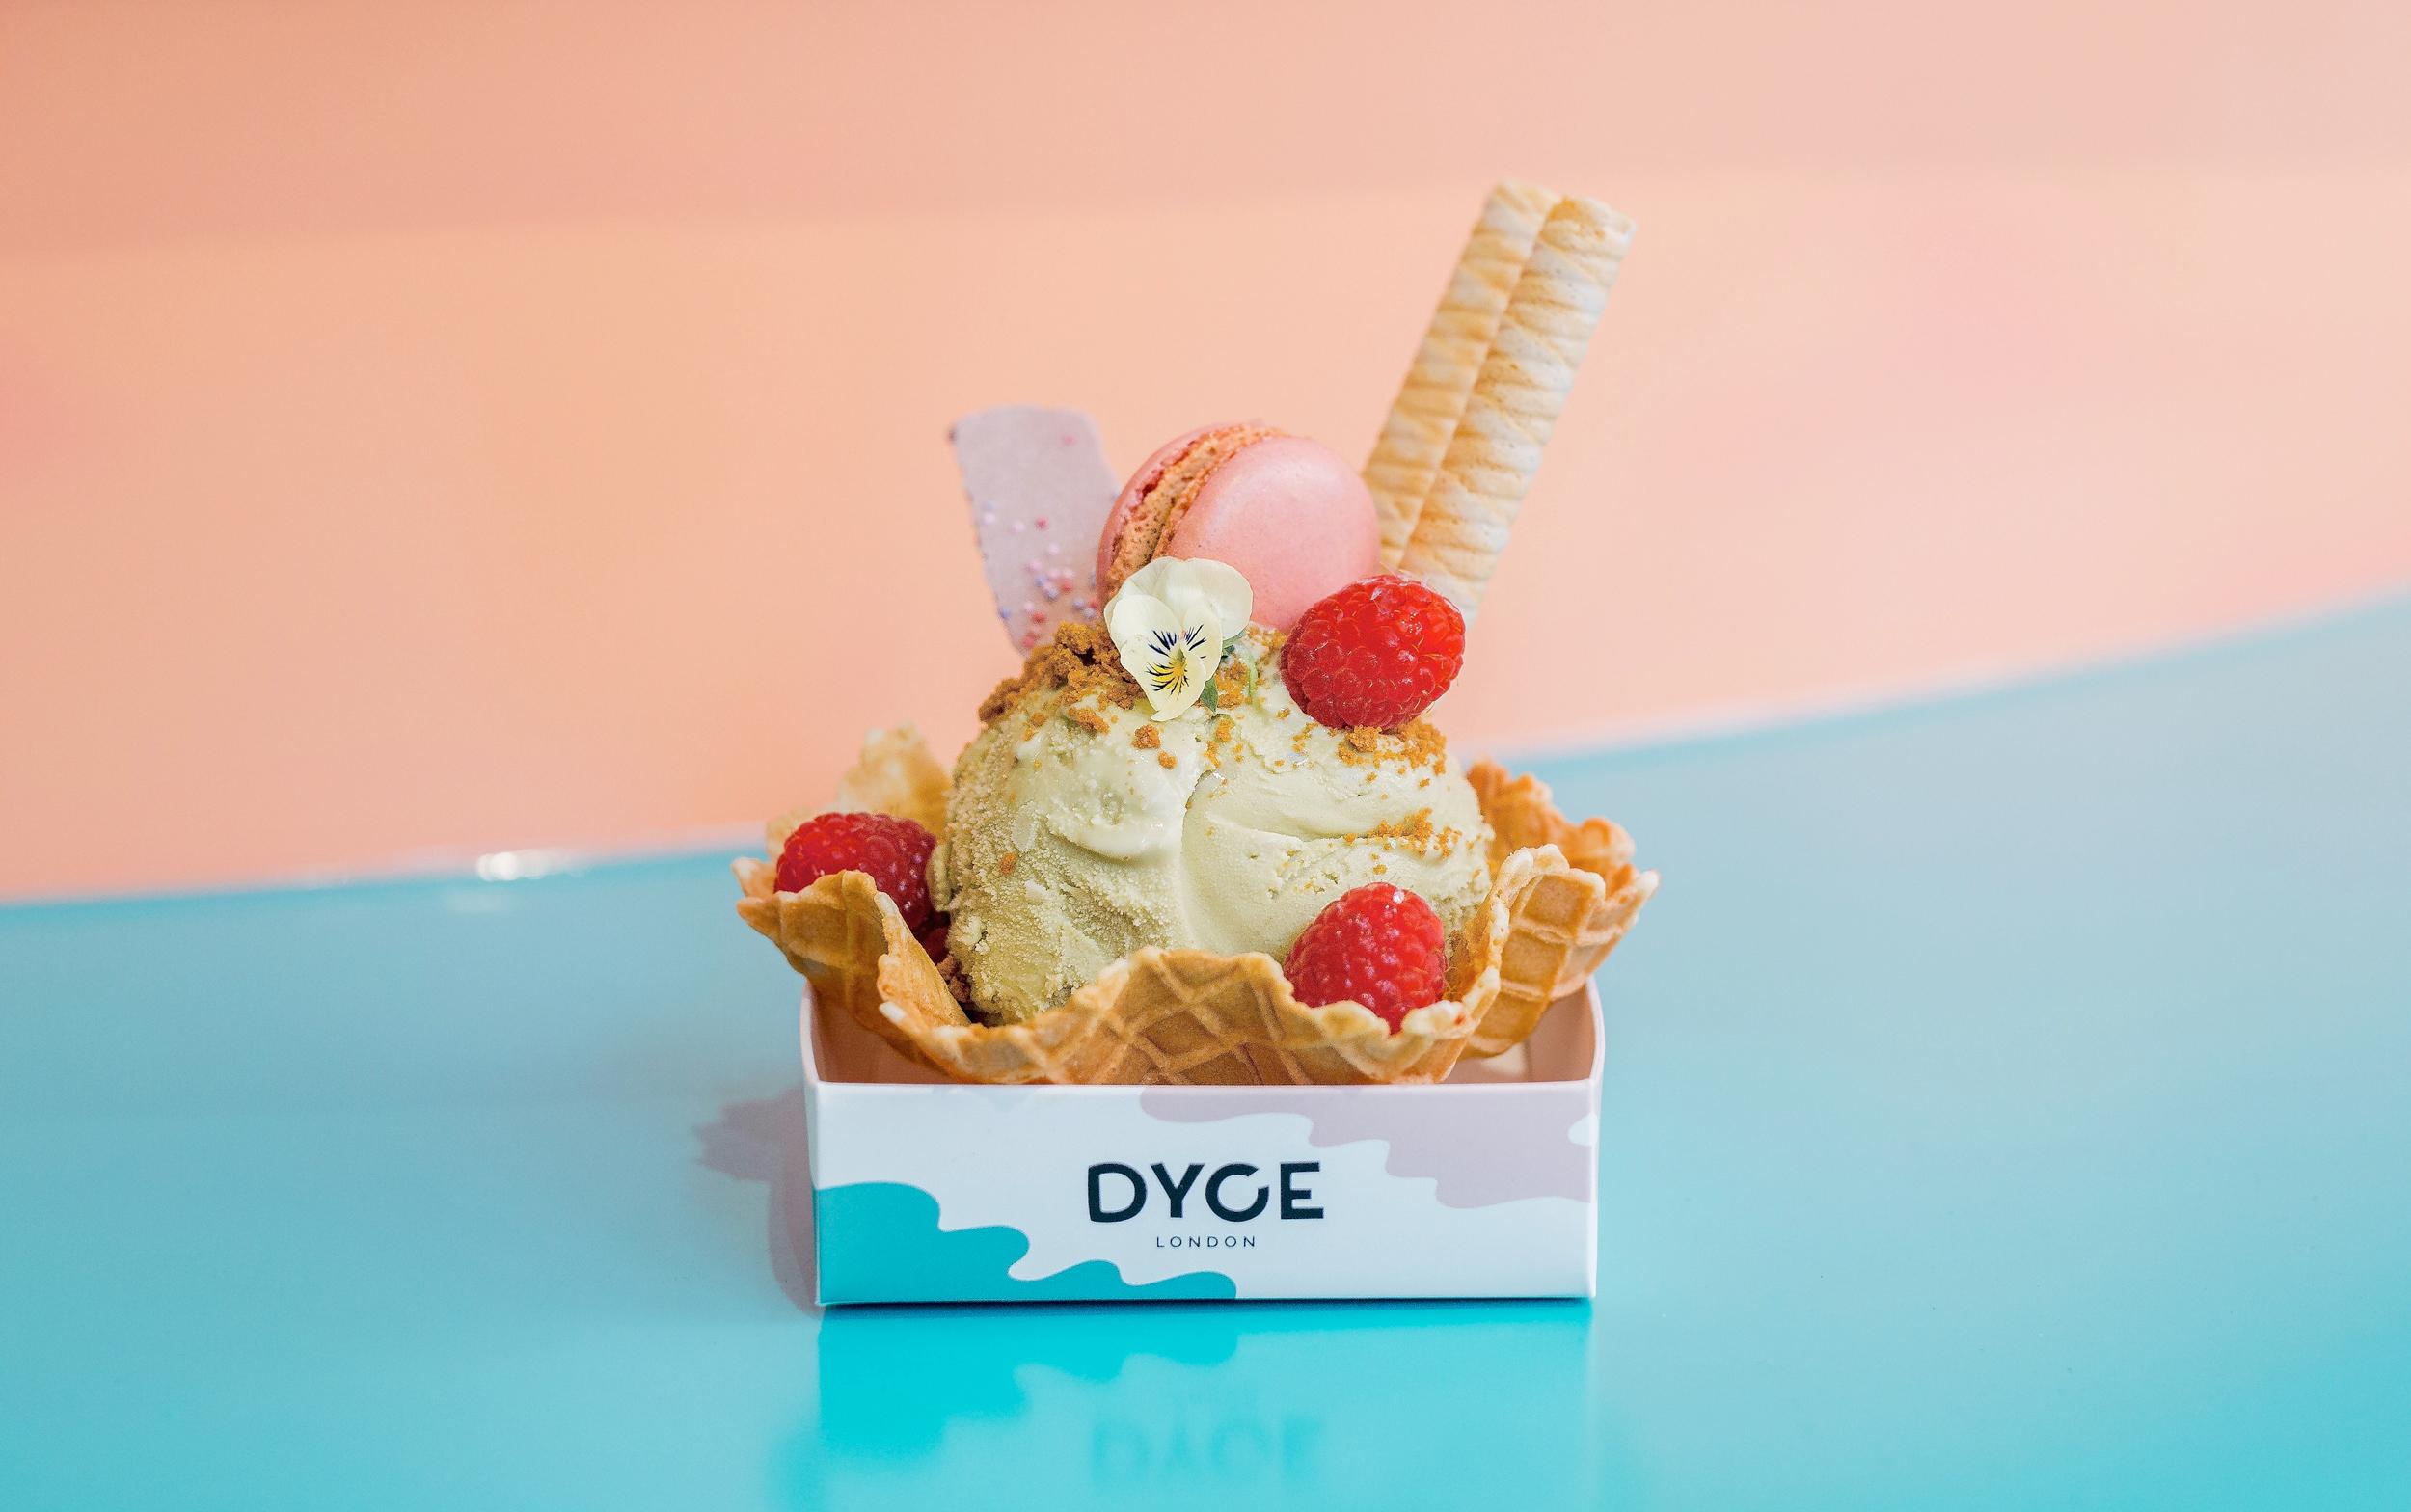 Dyce-120